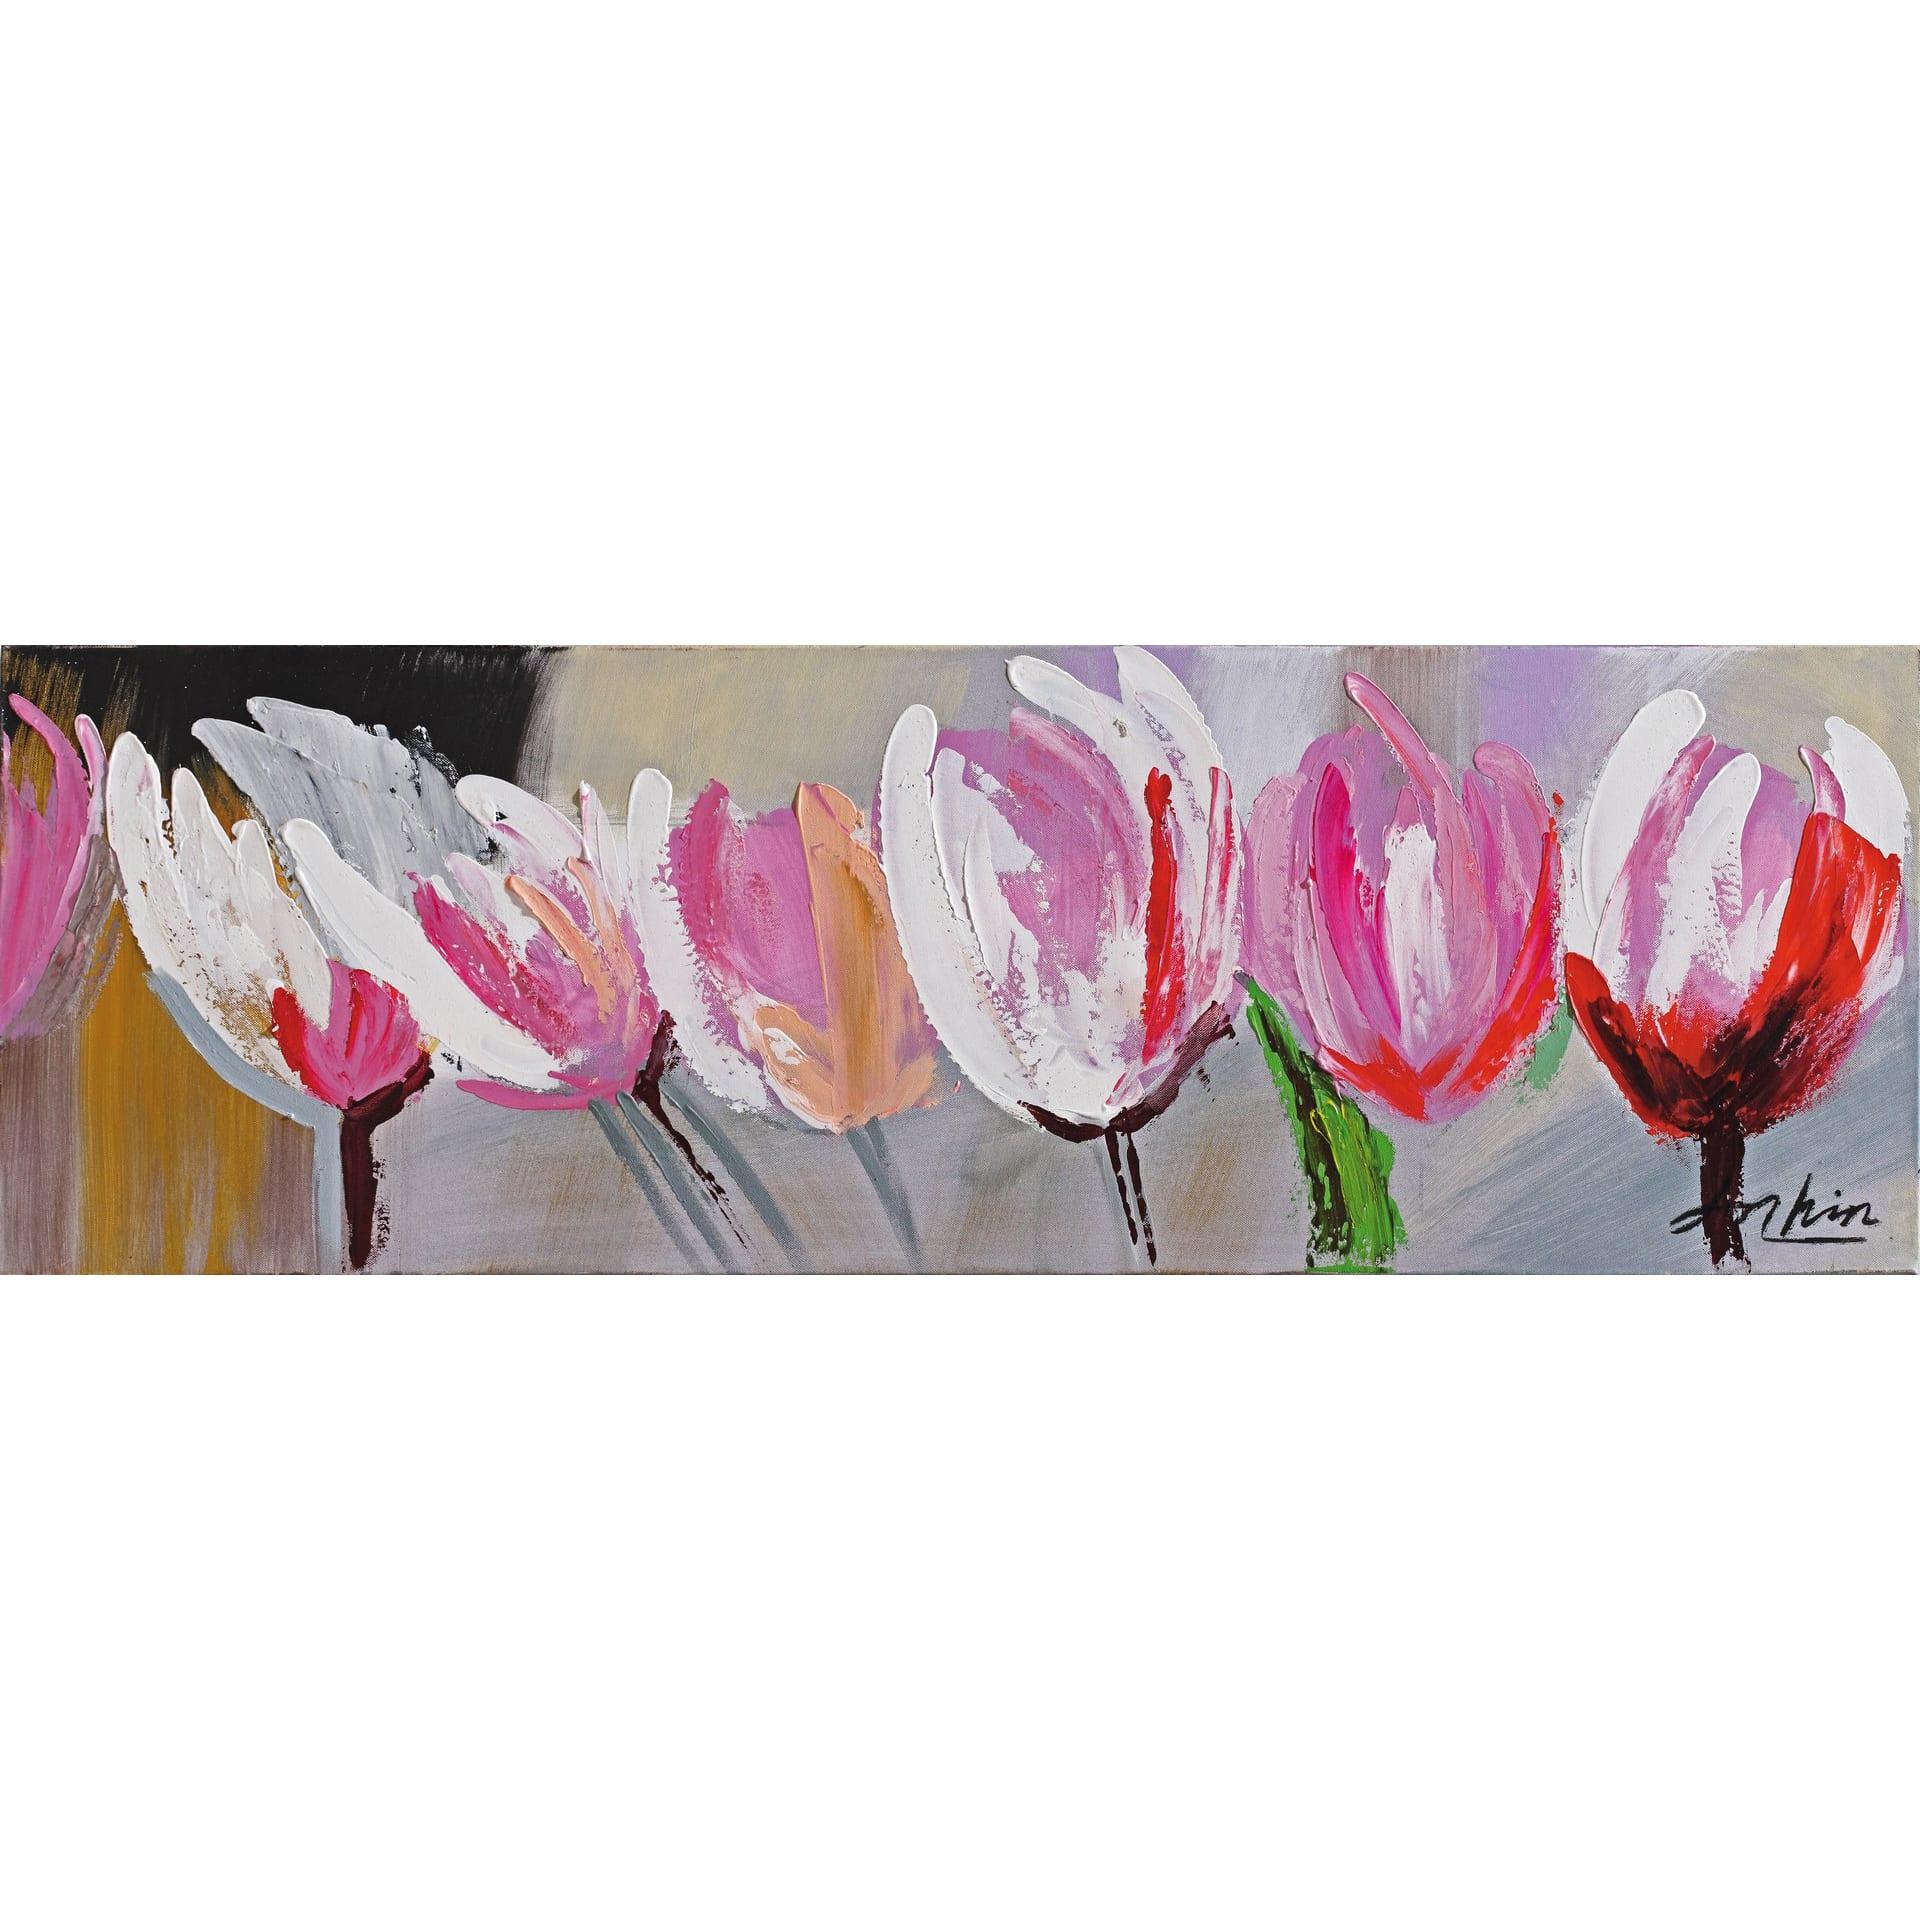 Quadri Cucina Leroy Merlin quadro dipinto a mano tulipani 90x30 cm